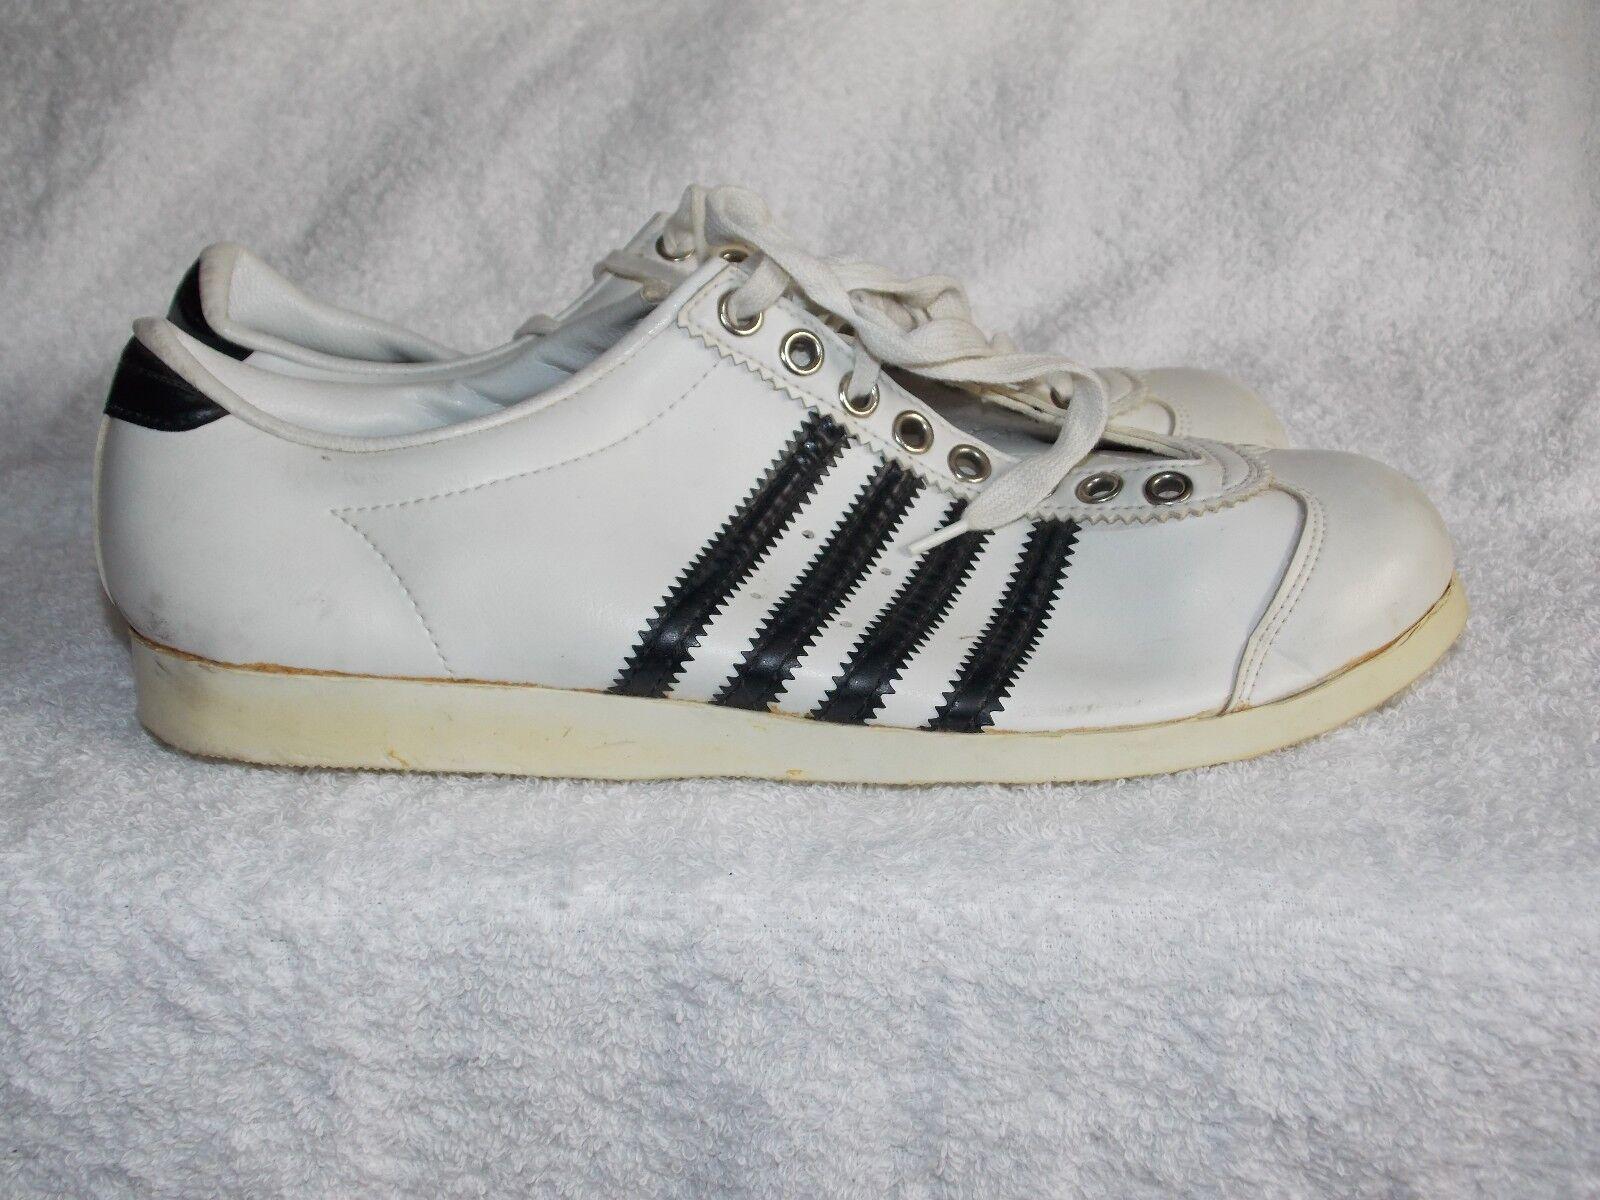 Sports WHITE BLACK Sneaker shoes 8 Women's Used